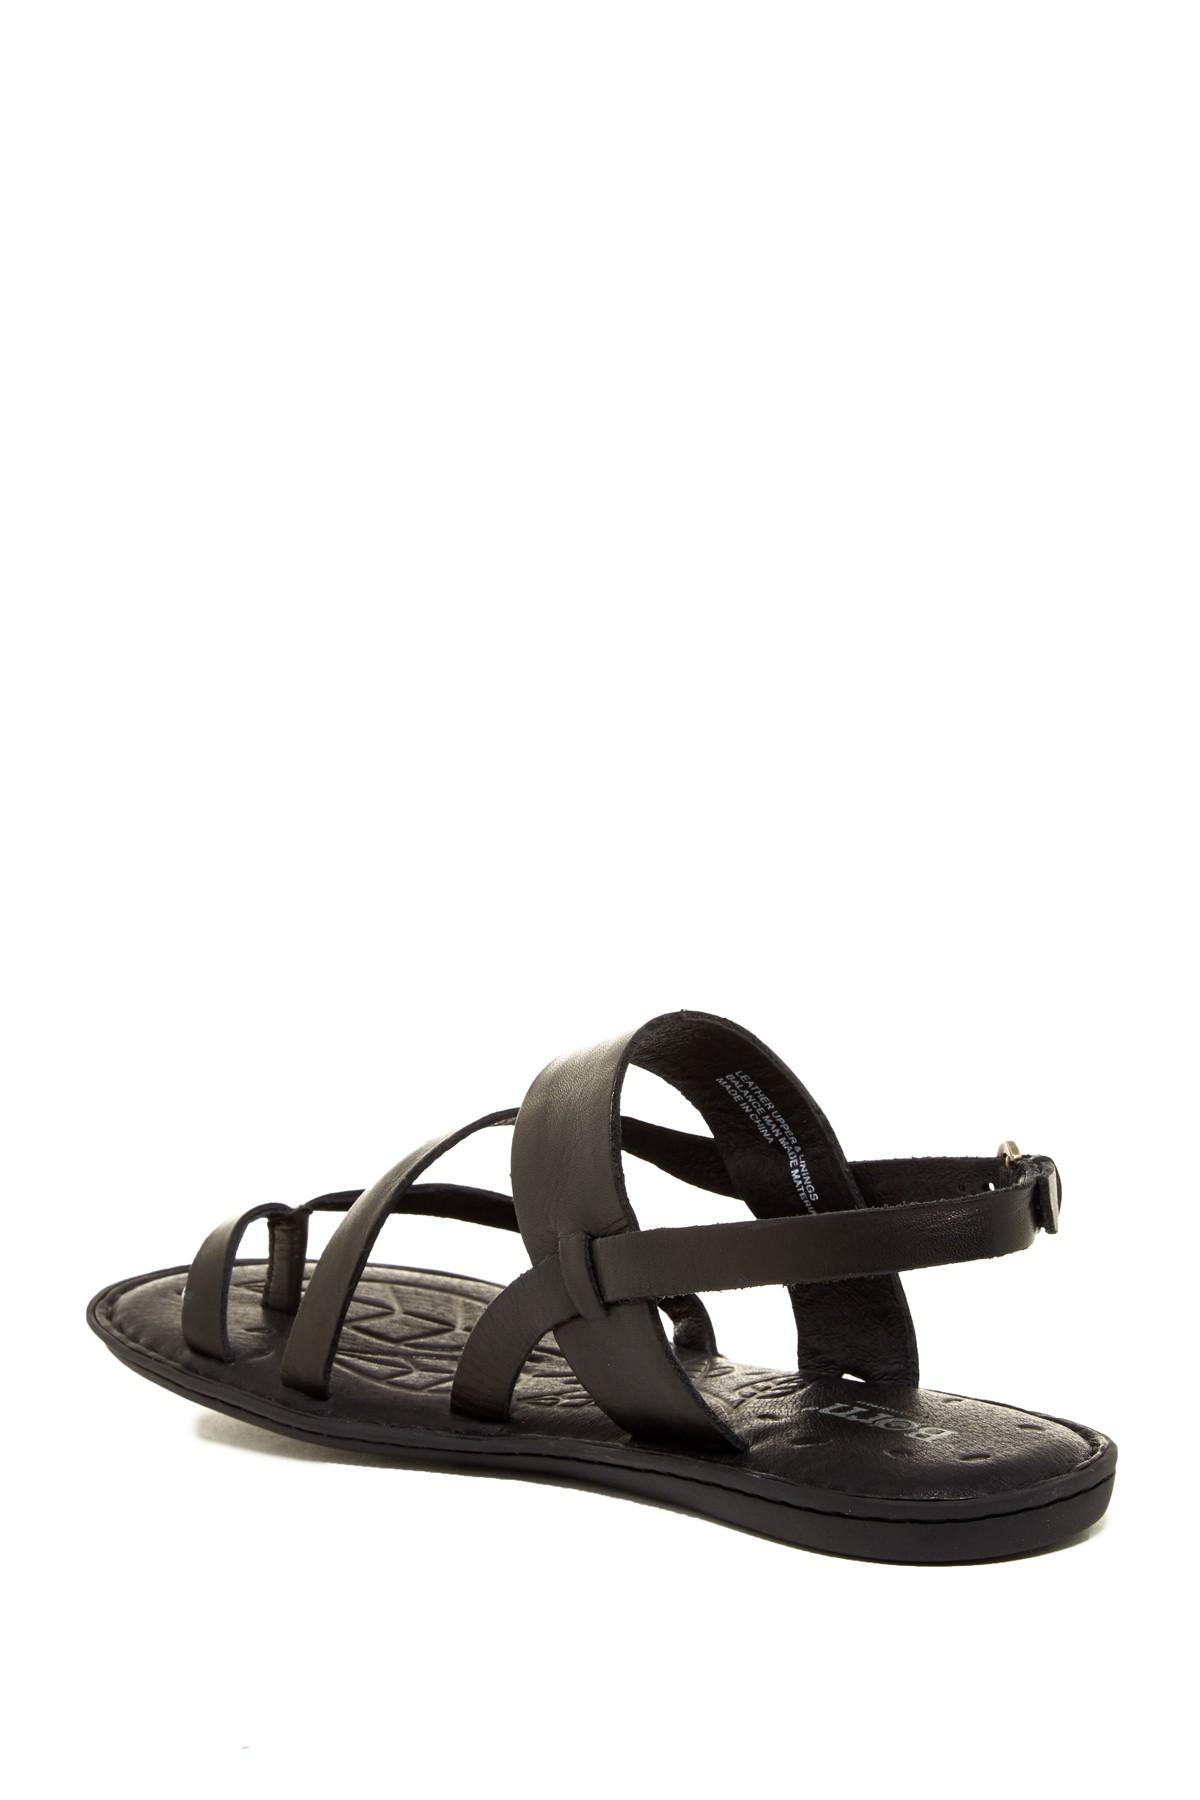 bed3d56dccf7 Born - Black Favignana Leather Sandal - Lyst. View fullscreen